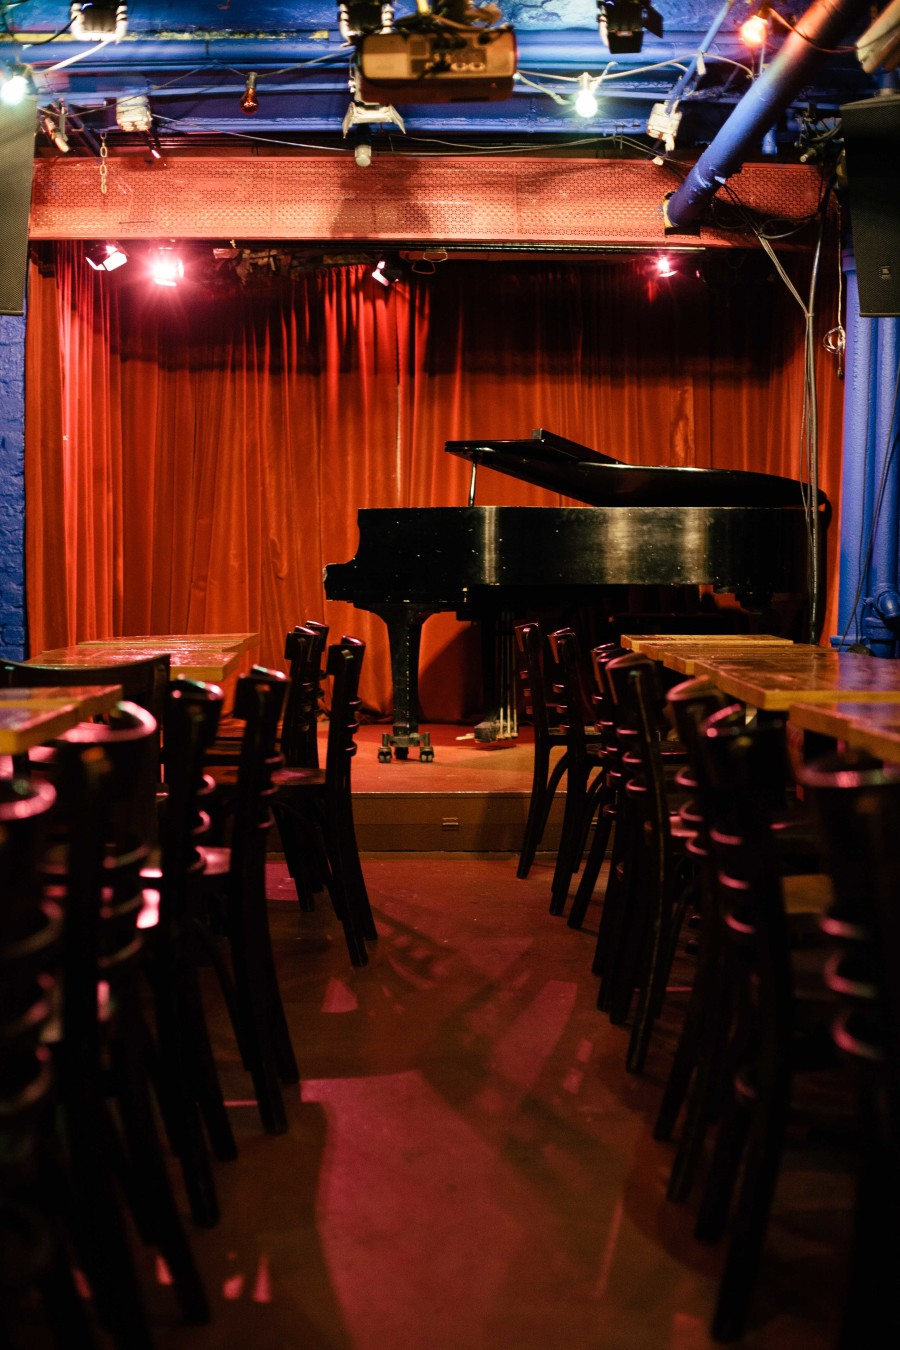 Cornelia Street cafe performance space